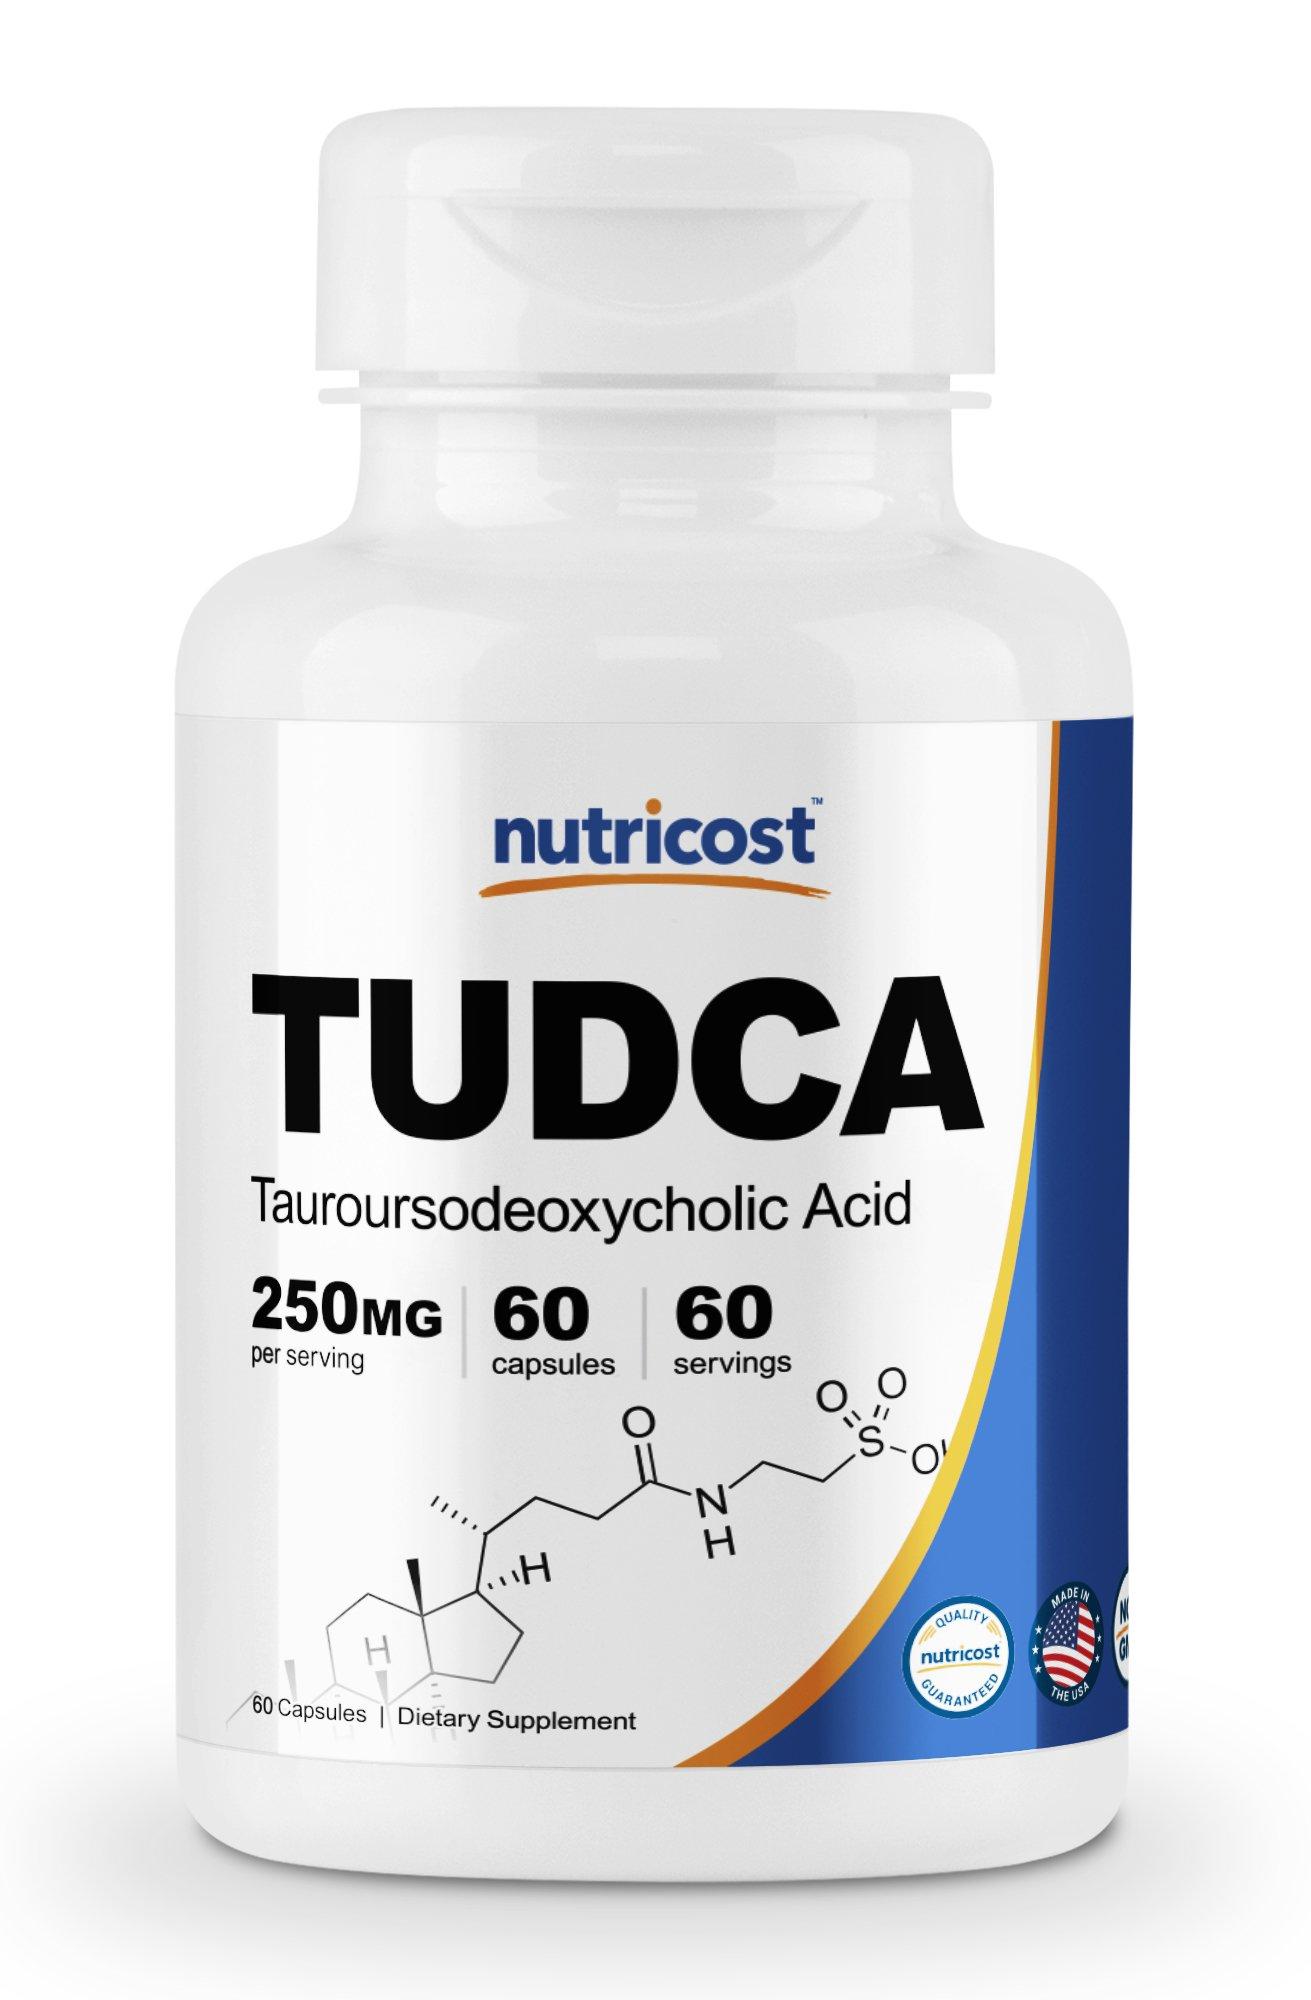 Nutricost Tudca 250mg, 60 Capsules (Tauroursodeoxycholic Acid) - Premium Quality